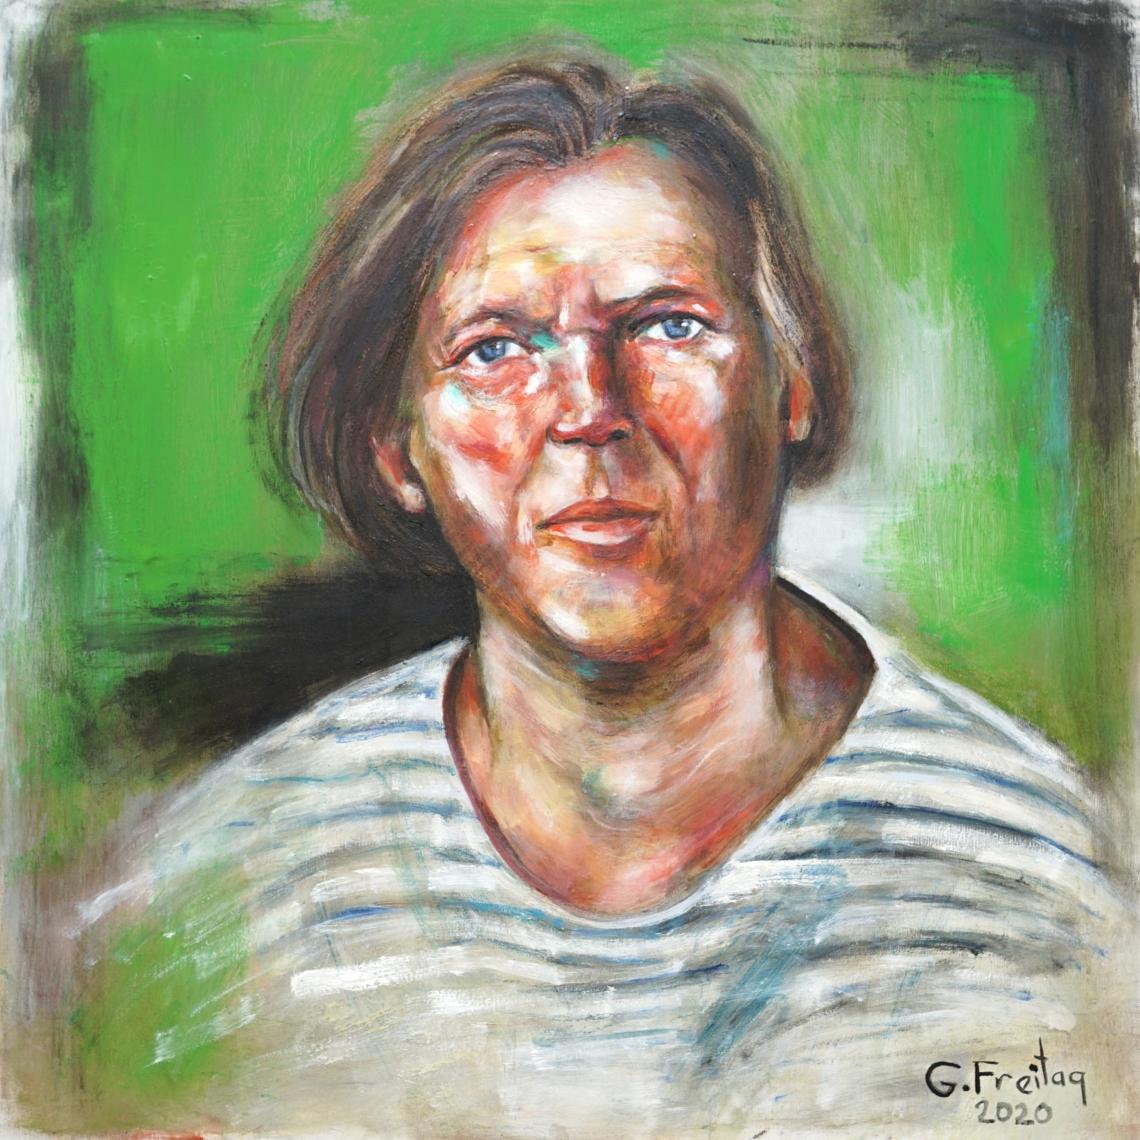 Gazmend Freitag: Selbstporträt, 2020,80 x 80 cm, Öl auf Leinwand